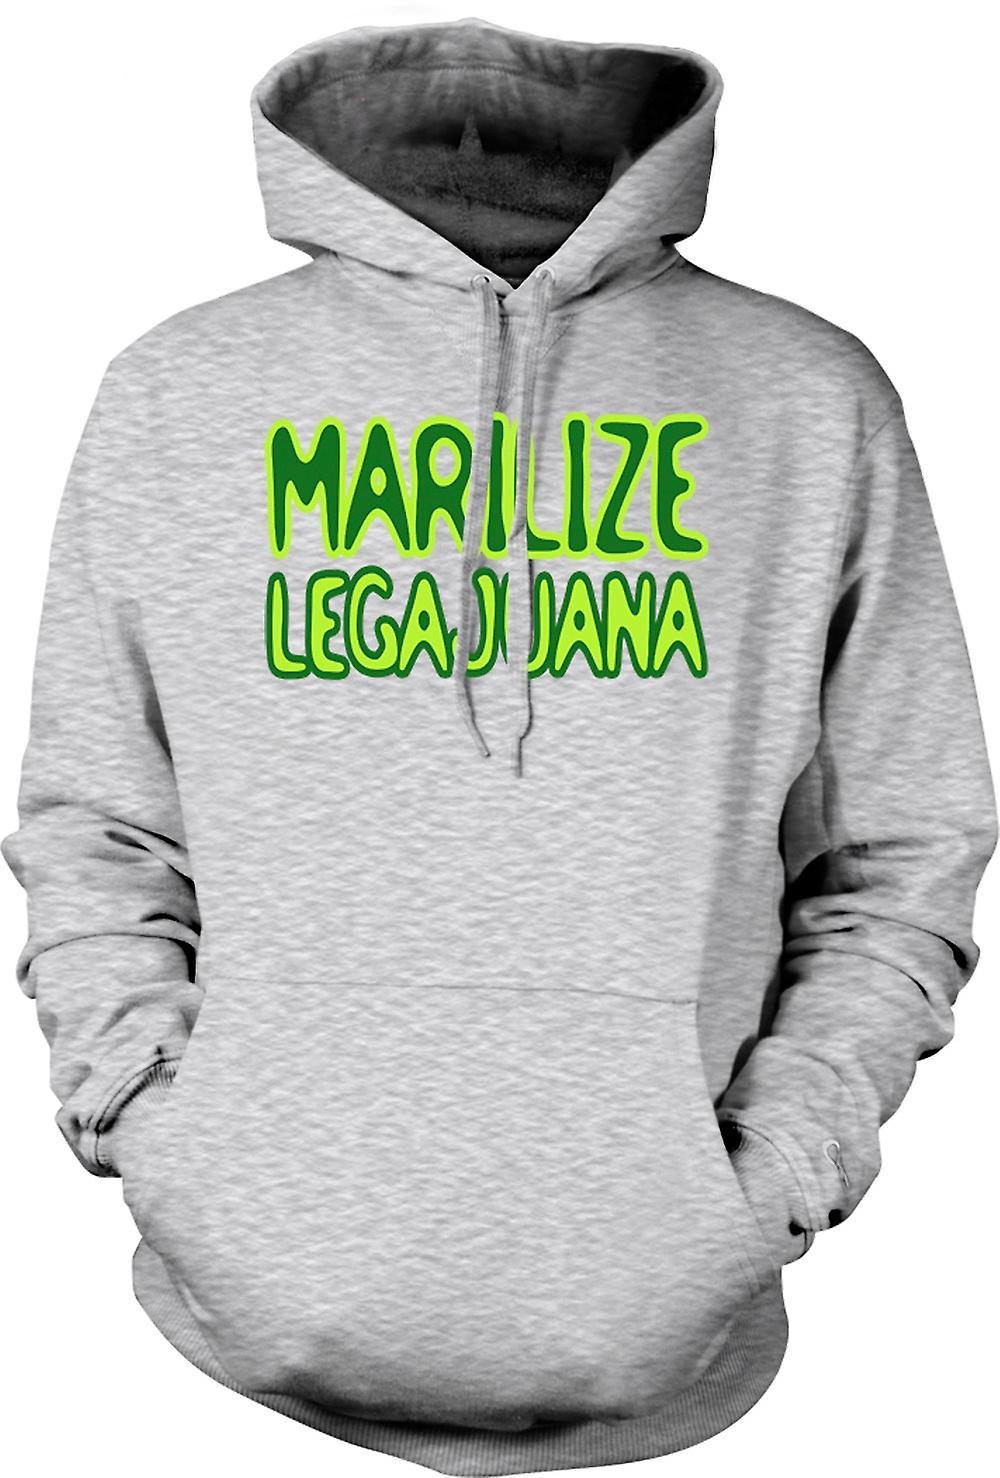 Mens Hoodie - Marilize Legajuana Weed